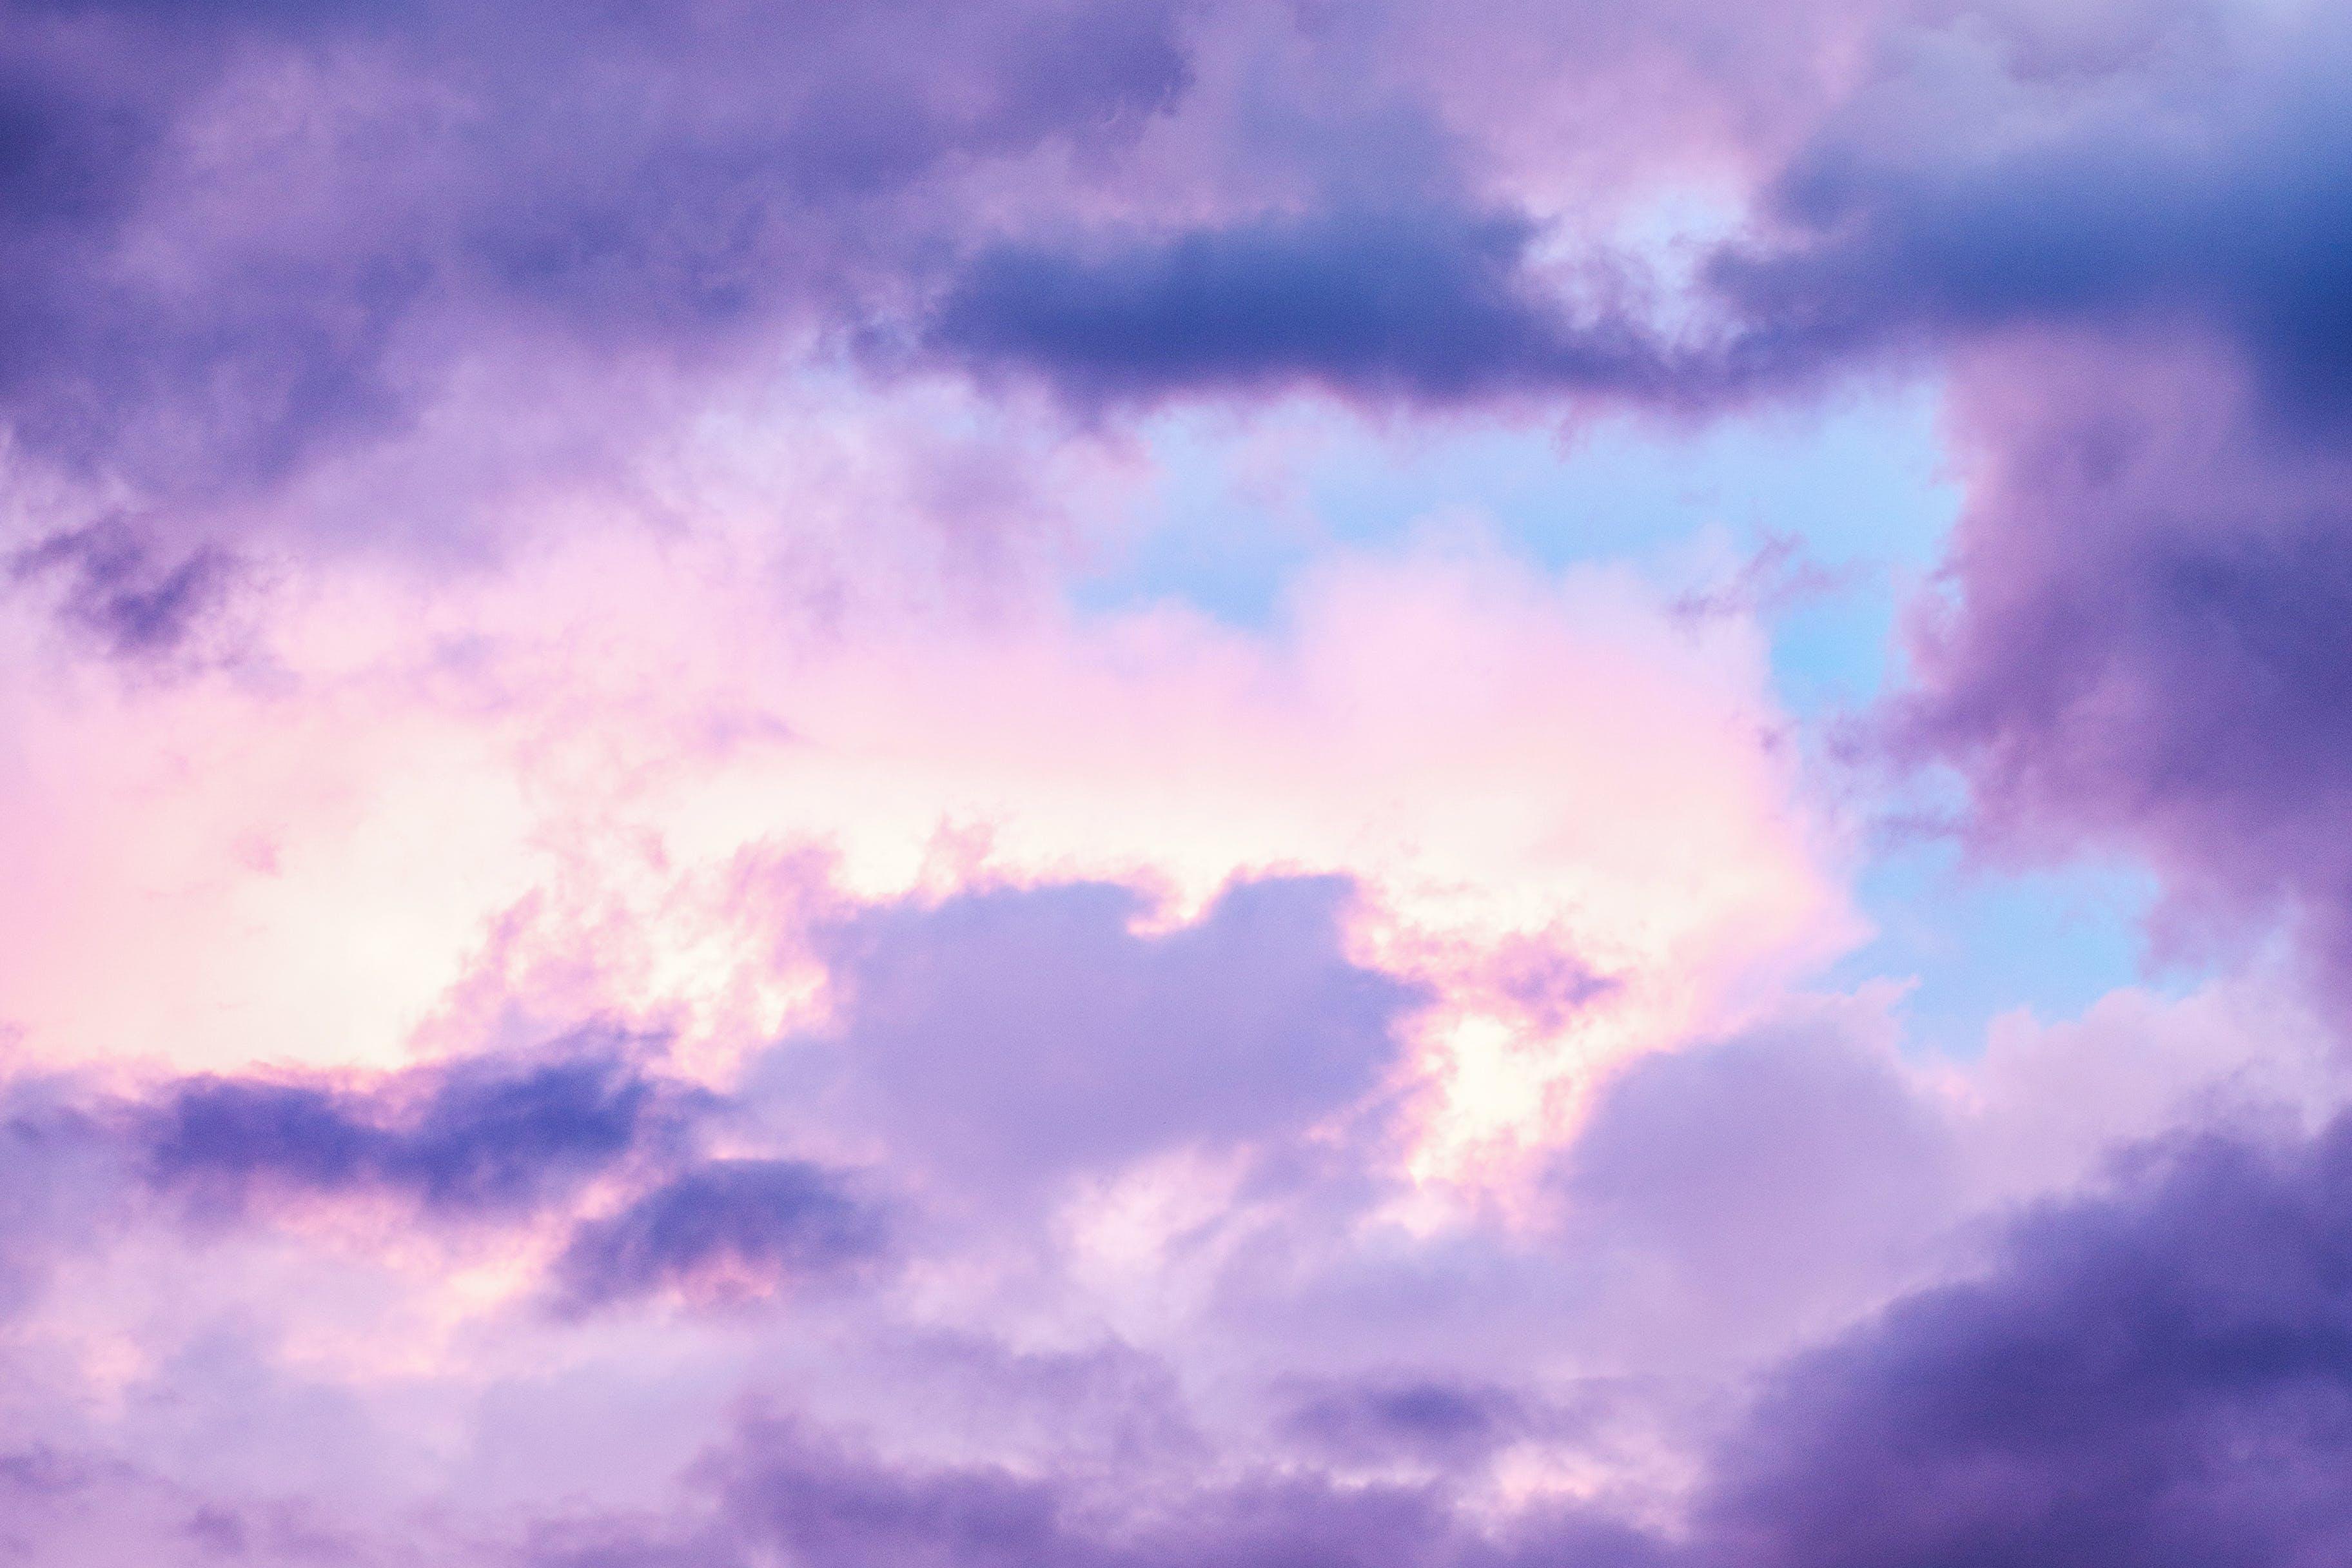 zu atmosphäre, desktop hintergrundbilder, hd wallpaper, himmel